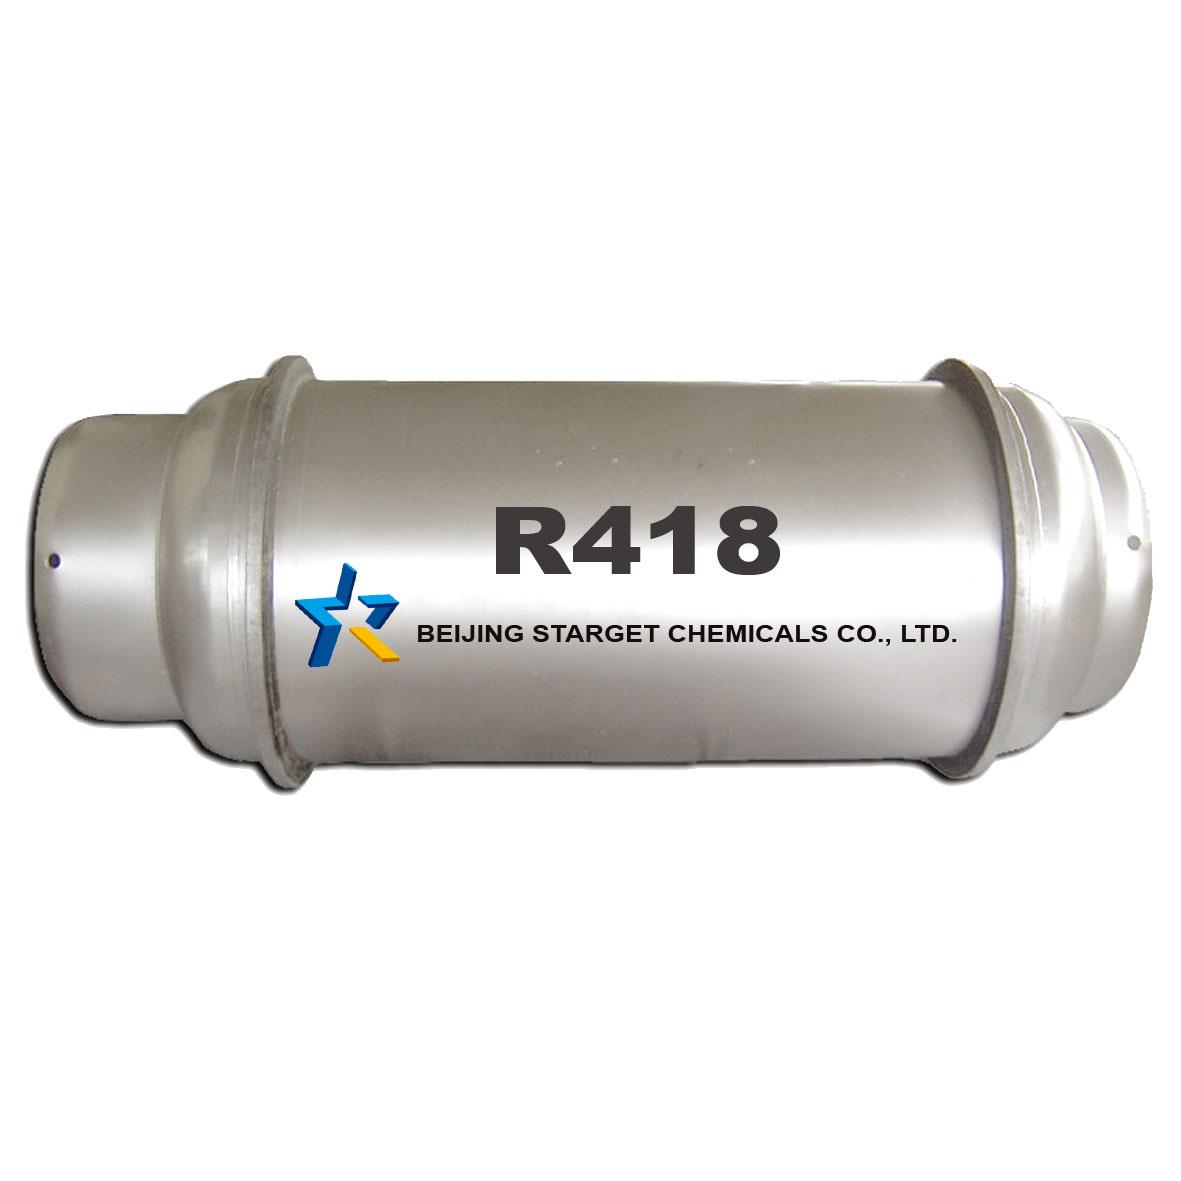 Refrigerant R418